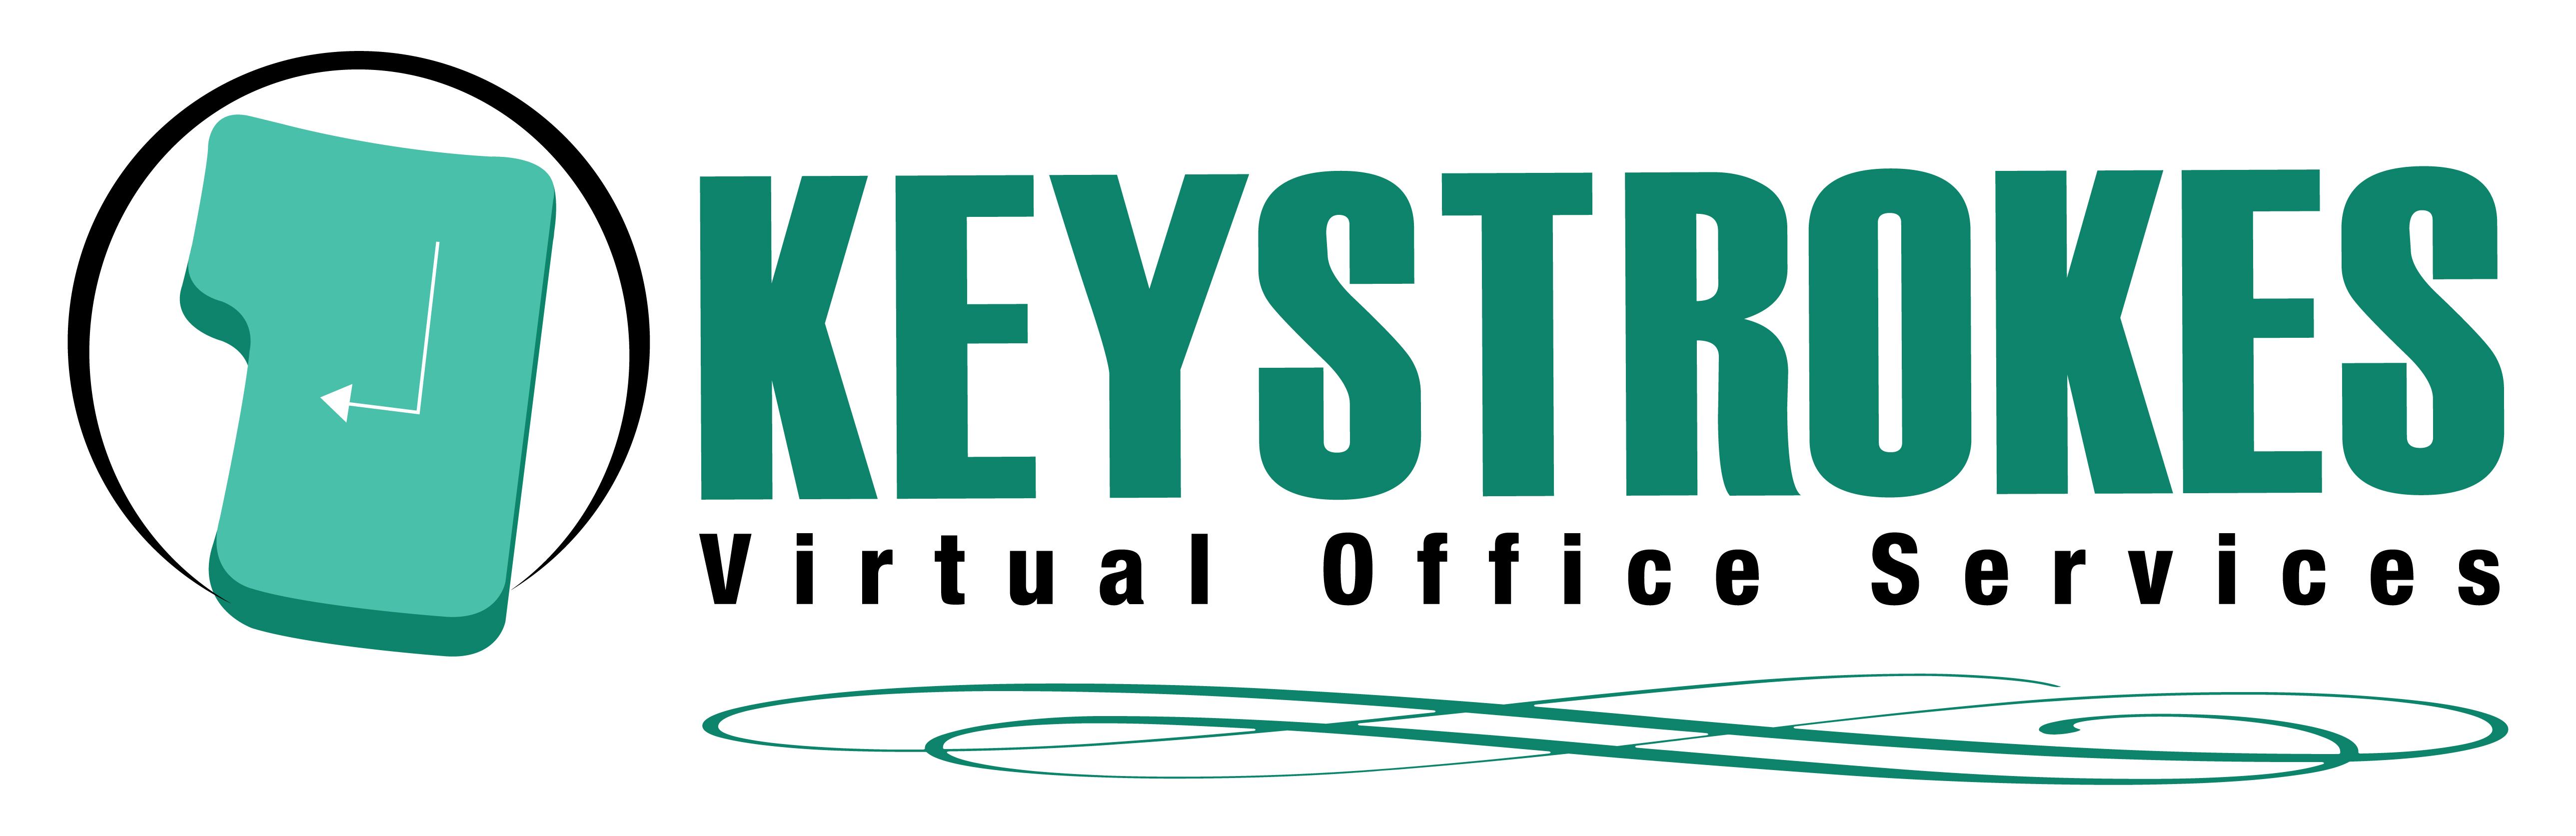 Keystrokes Virtual Assistant